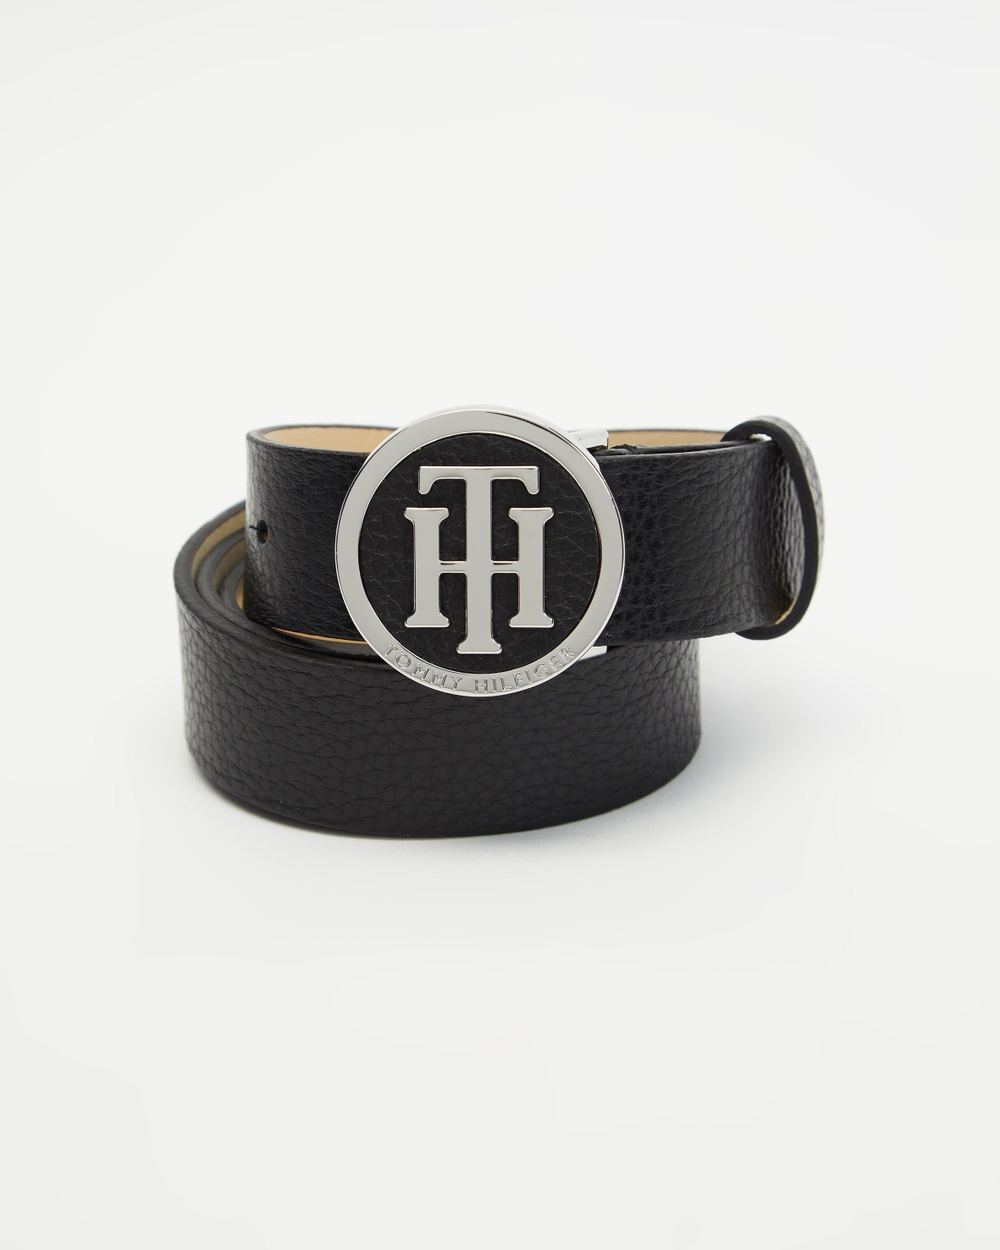 Tommy Hilfiger Statement Round Buckle Leather Belt Belts Black